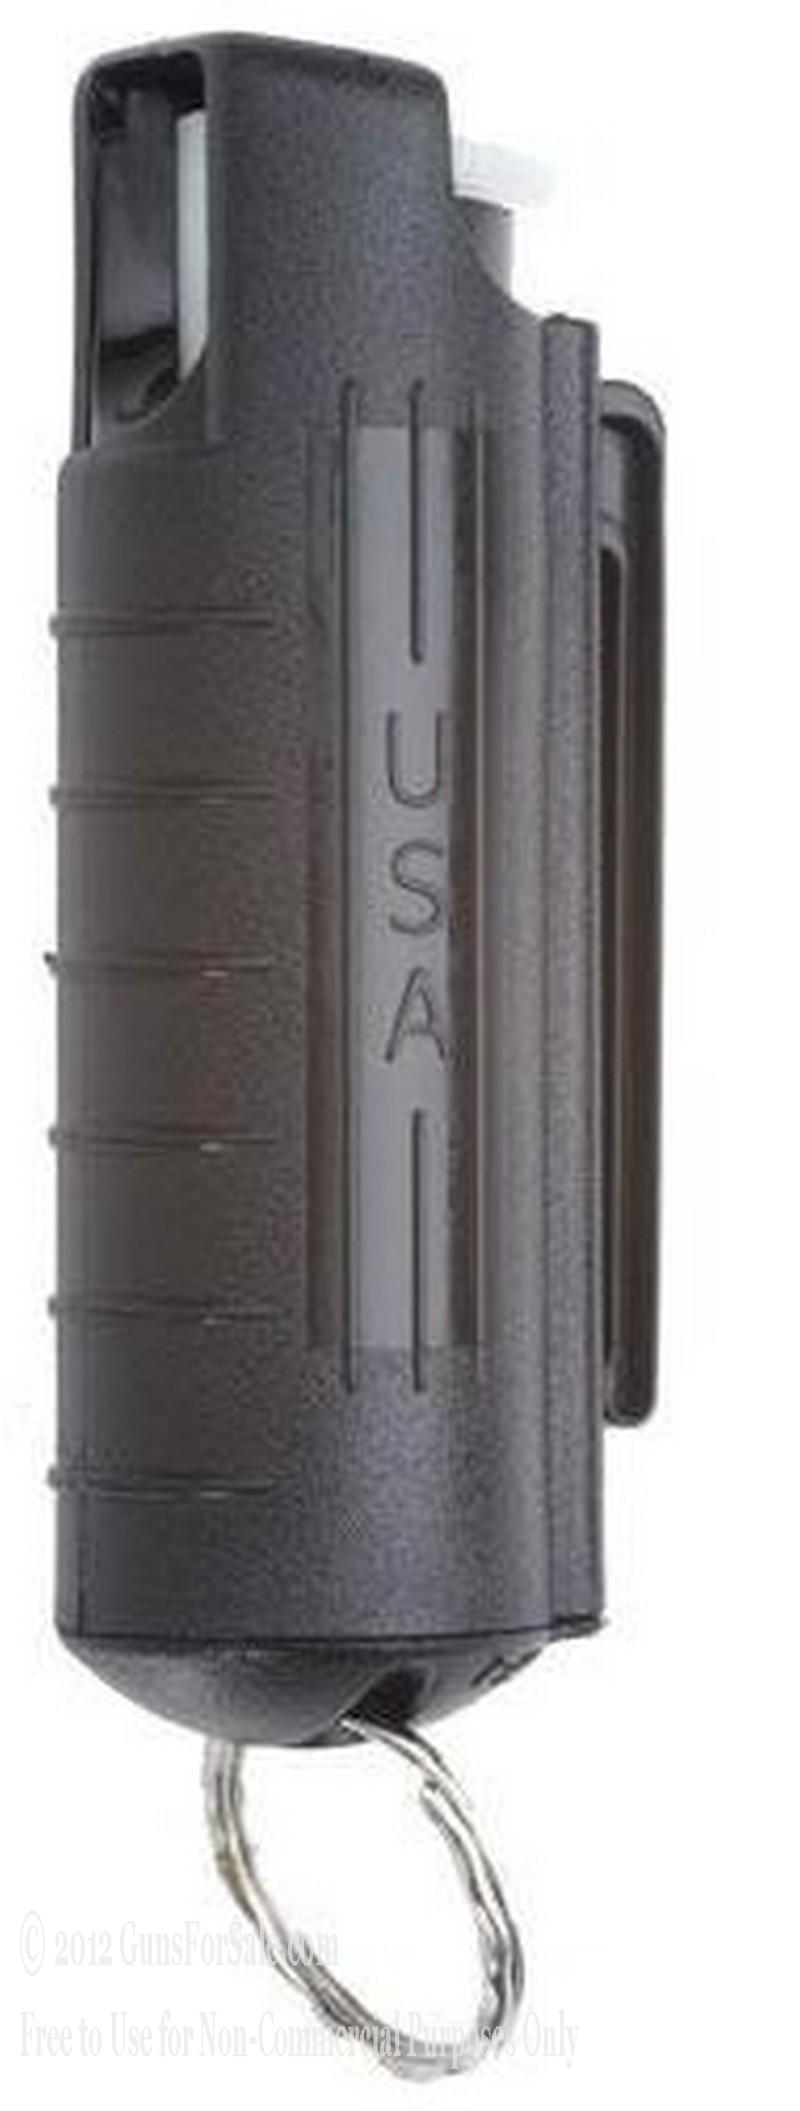 Mace - 10% Pepper Spray - Hard Key Case with Key Ring - Black - 1